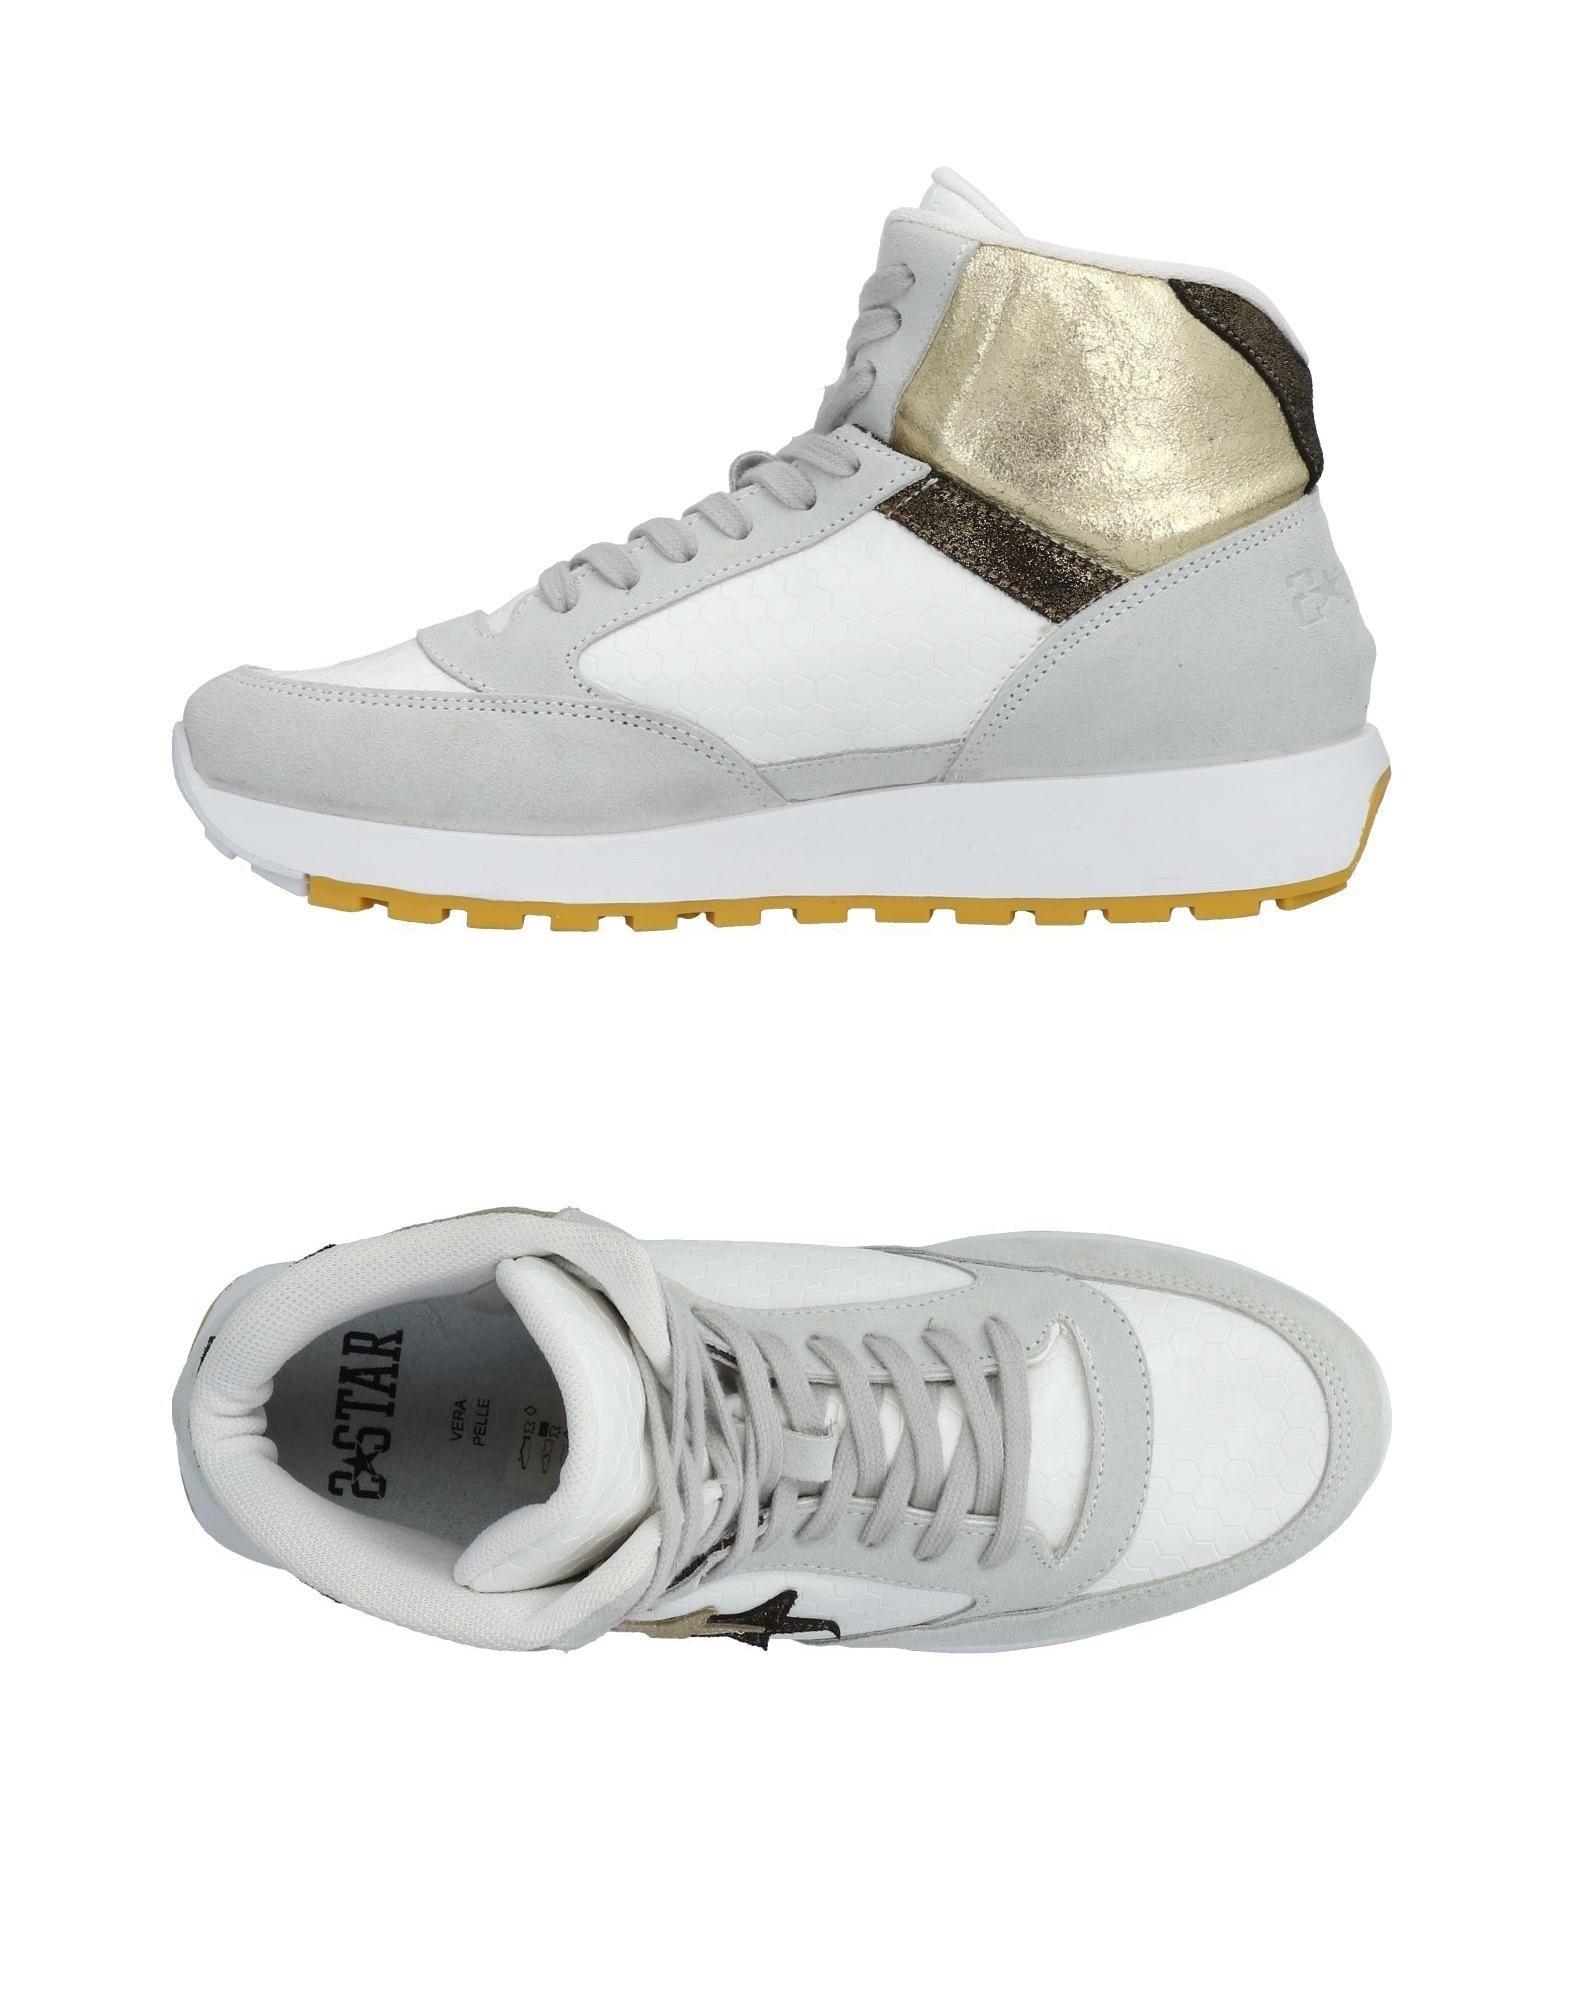 Moda Sneakers - 2Star Donna - Sneakers 11473064JP 726005